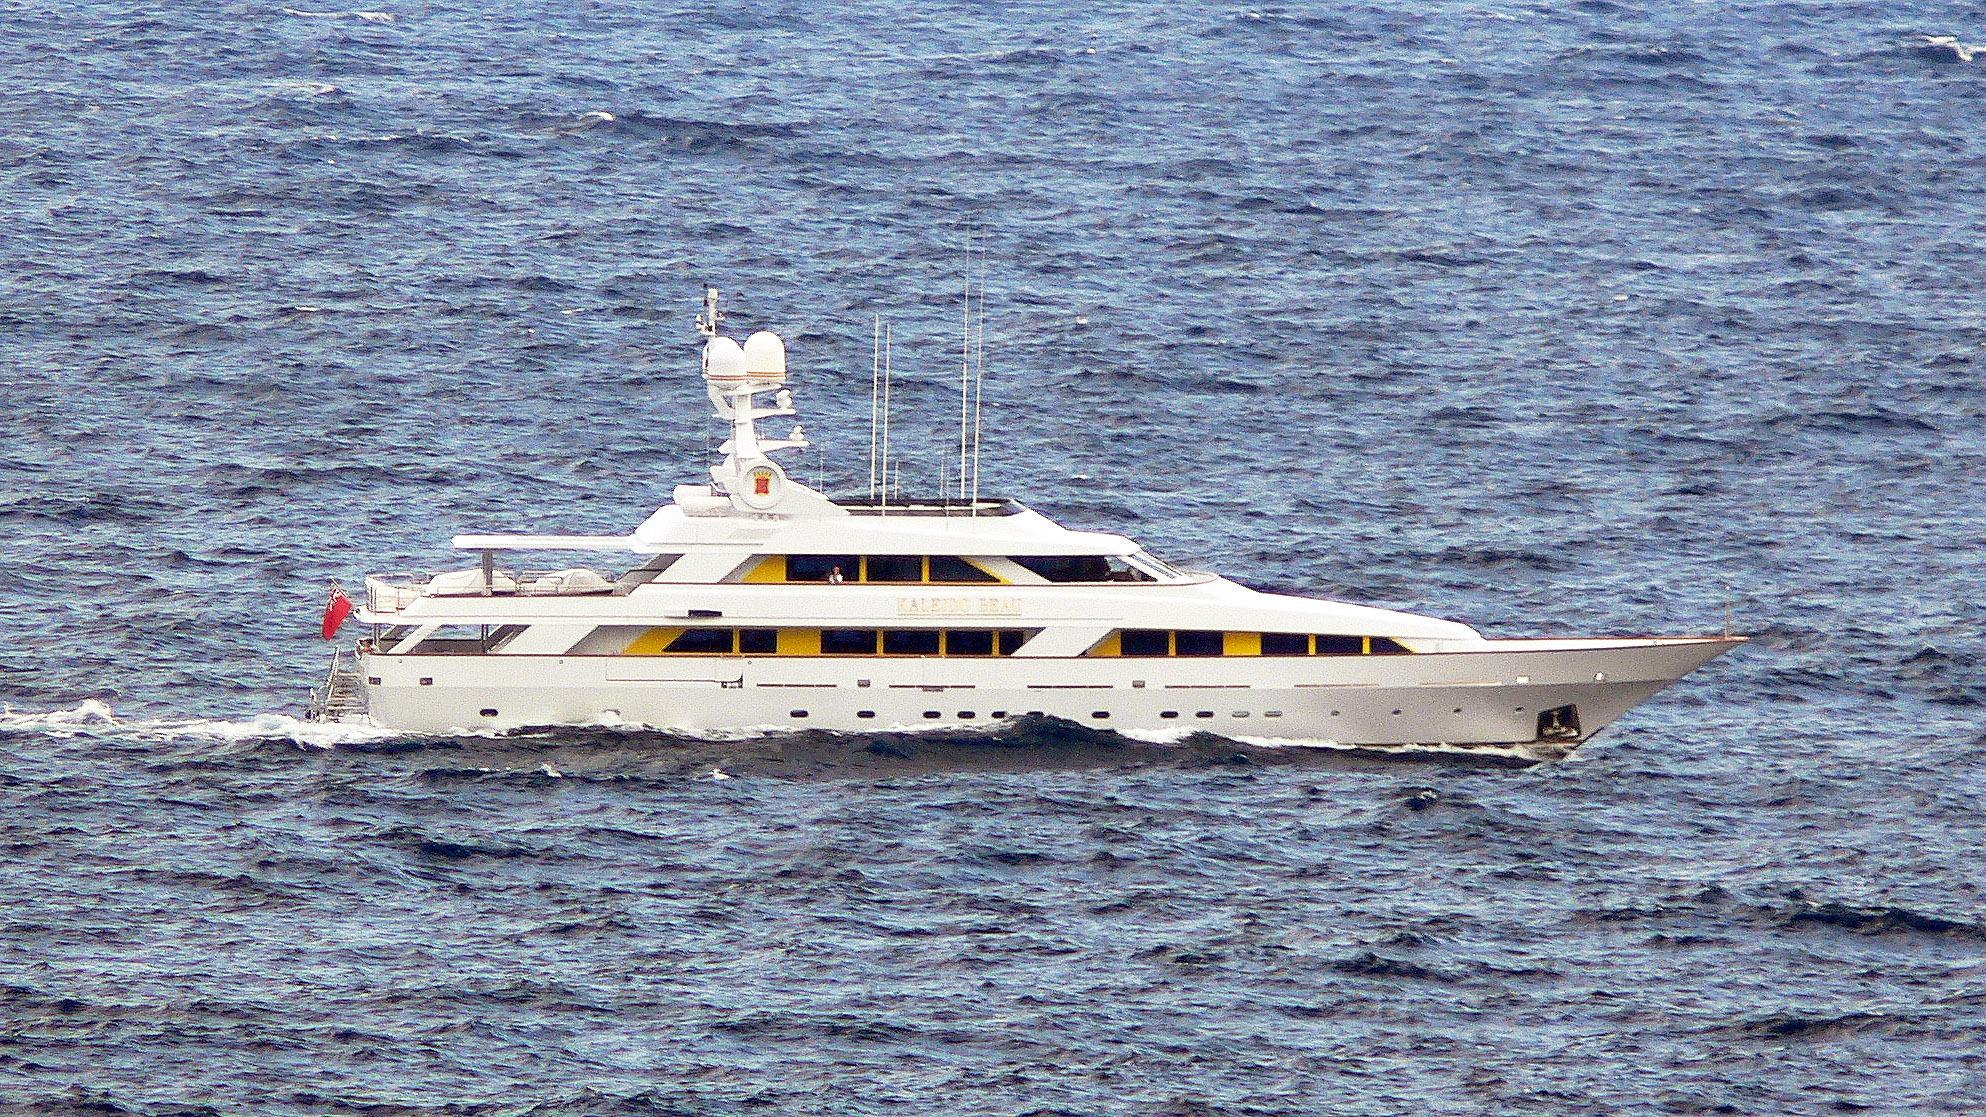 mistress-motor-yacht-benetti-45m-1990-46m-running-profile